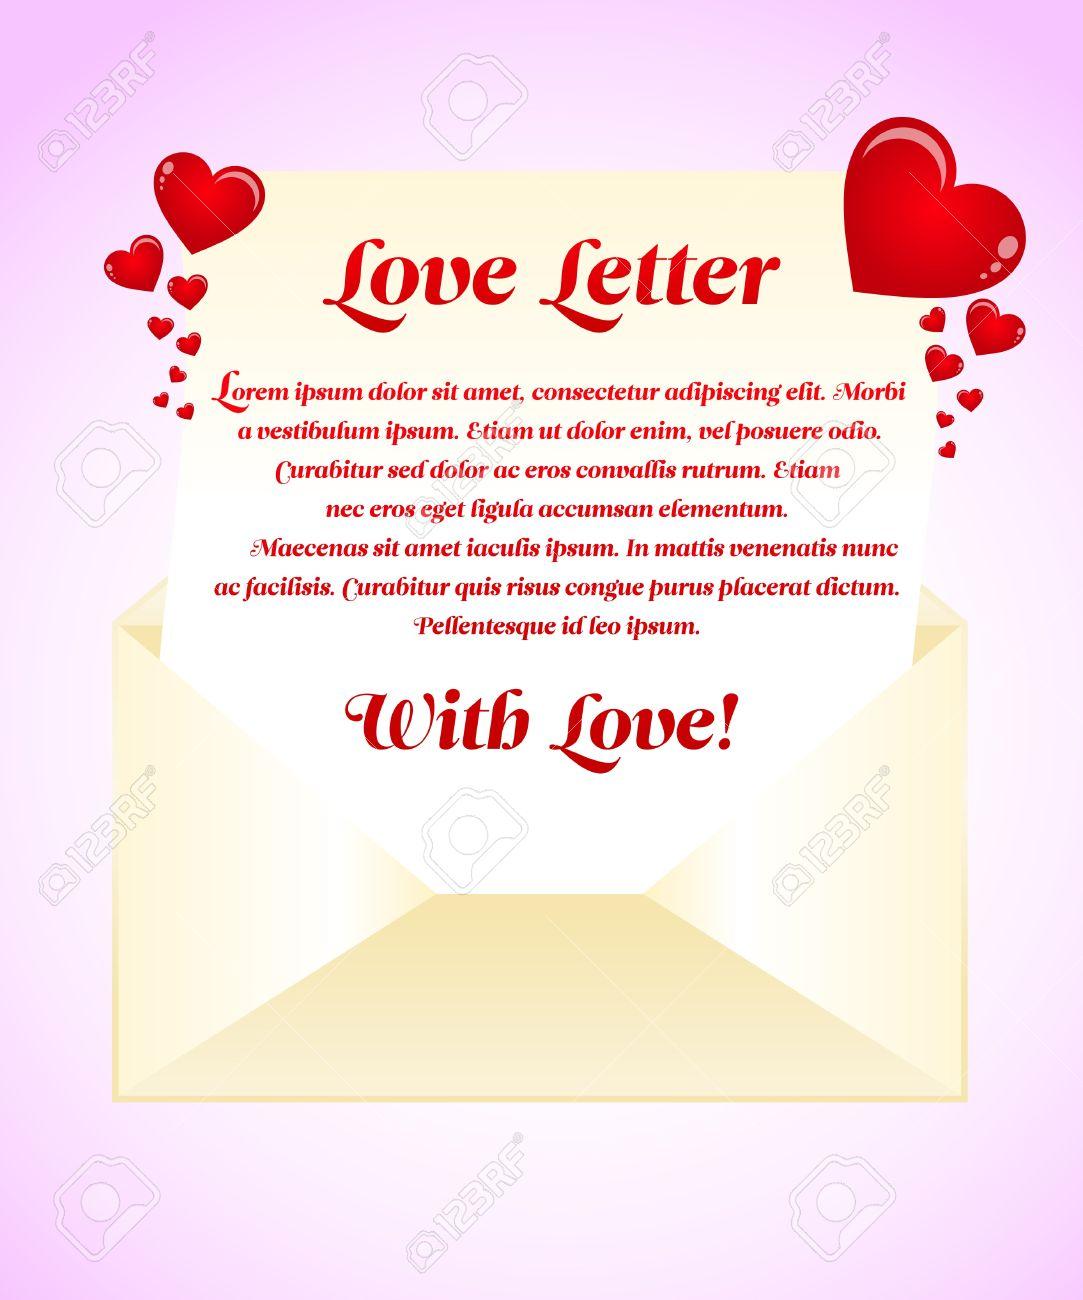 Doc585350 Love Letter Templates Free 65 Love Letter Templates – Templates for Love Letters